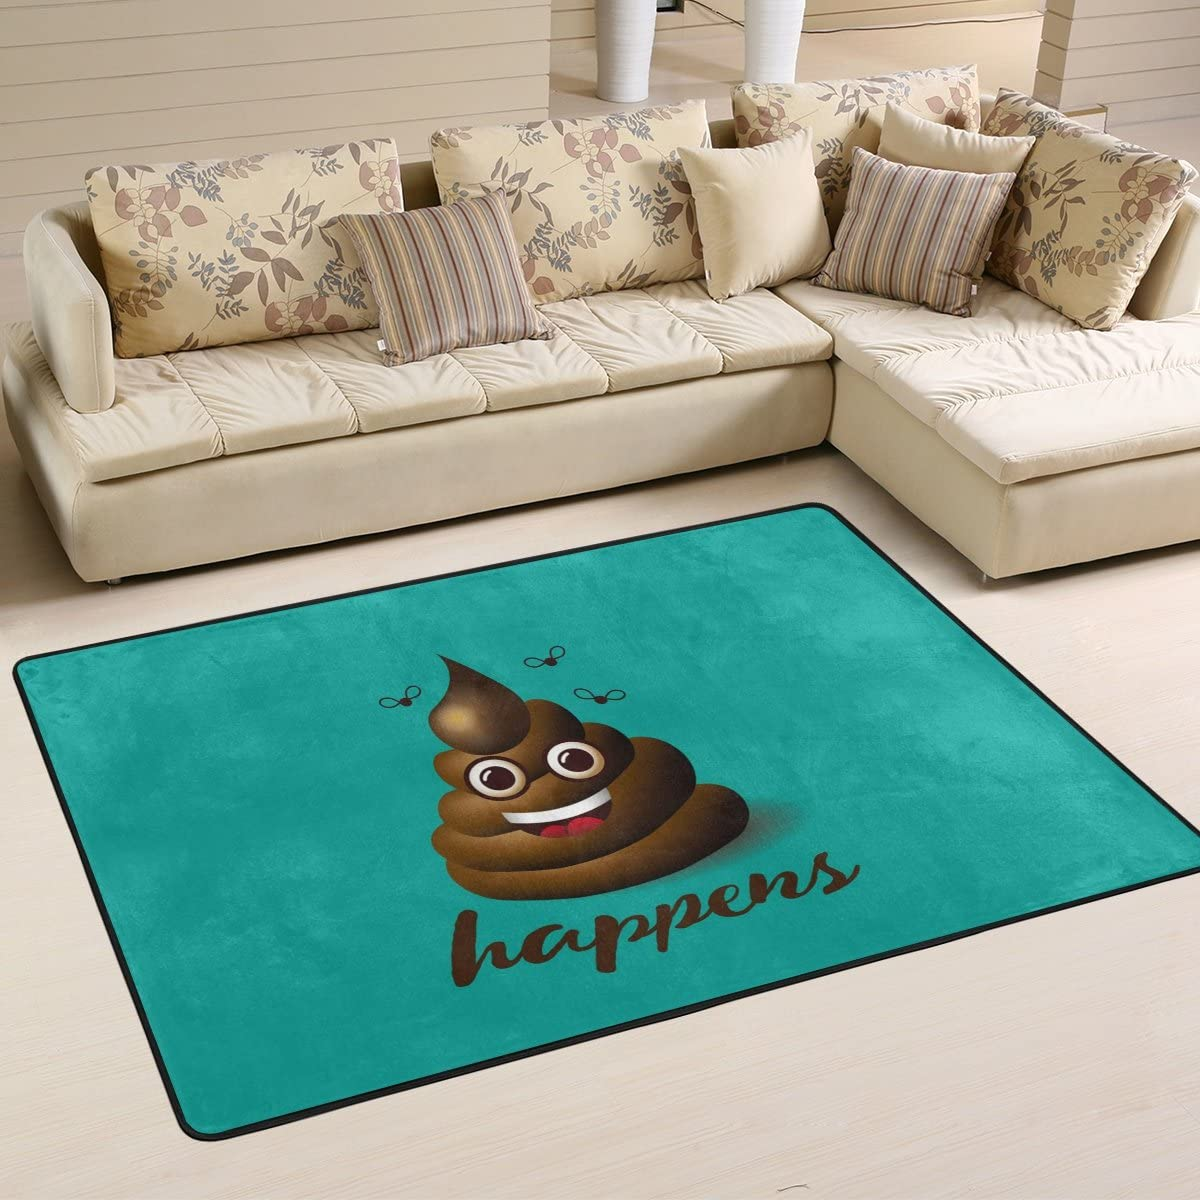 ALAZA Non Slip Area Rug Home Decor, Smiling Face Poop Emoji Durable Floor Mat Living Room Bedroom Carpets Doormats 72 x 48 inches